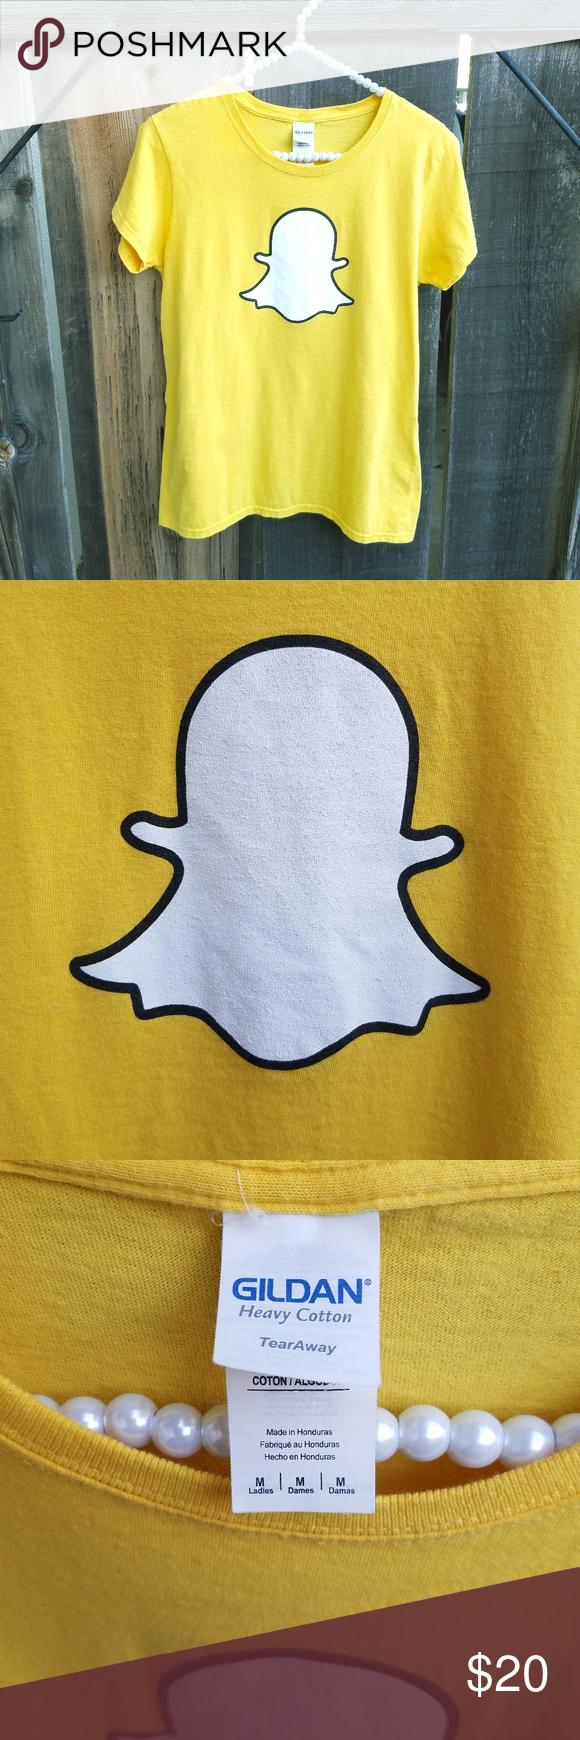 Snapchat Logo Tshirt Snapchat logo, Tshirt logo, Yellow